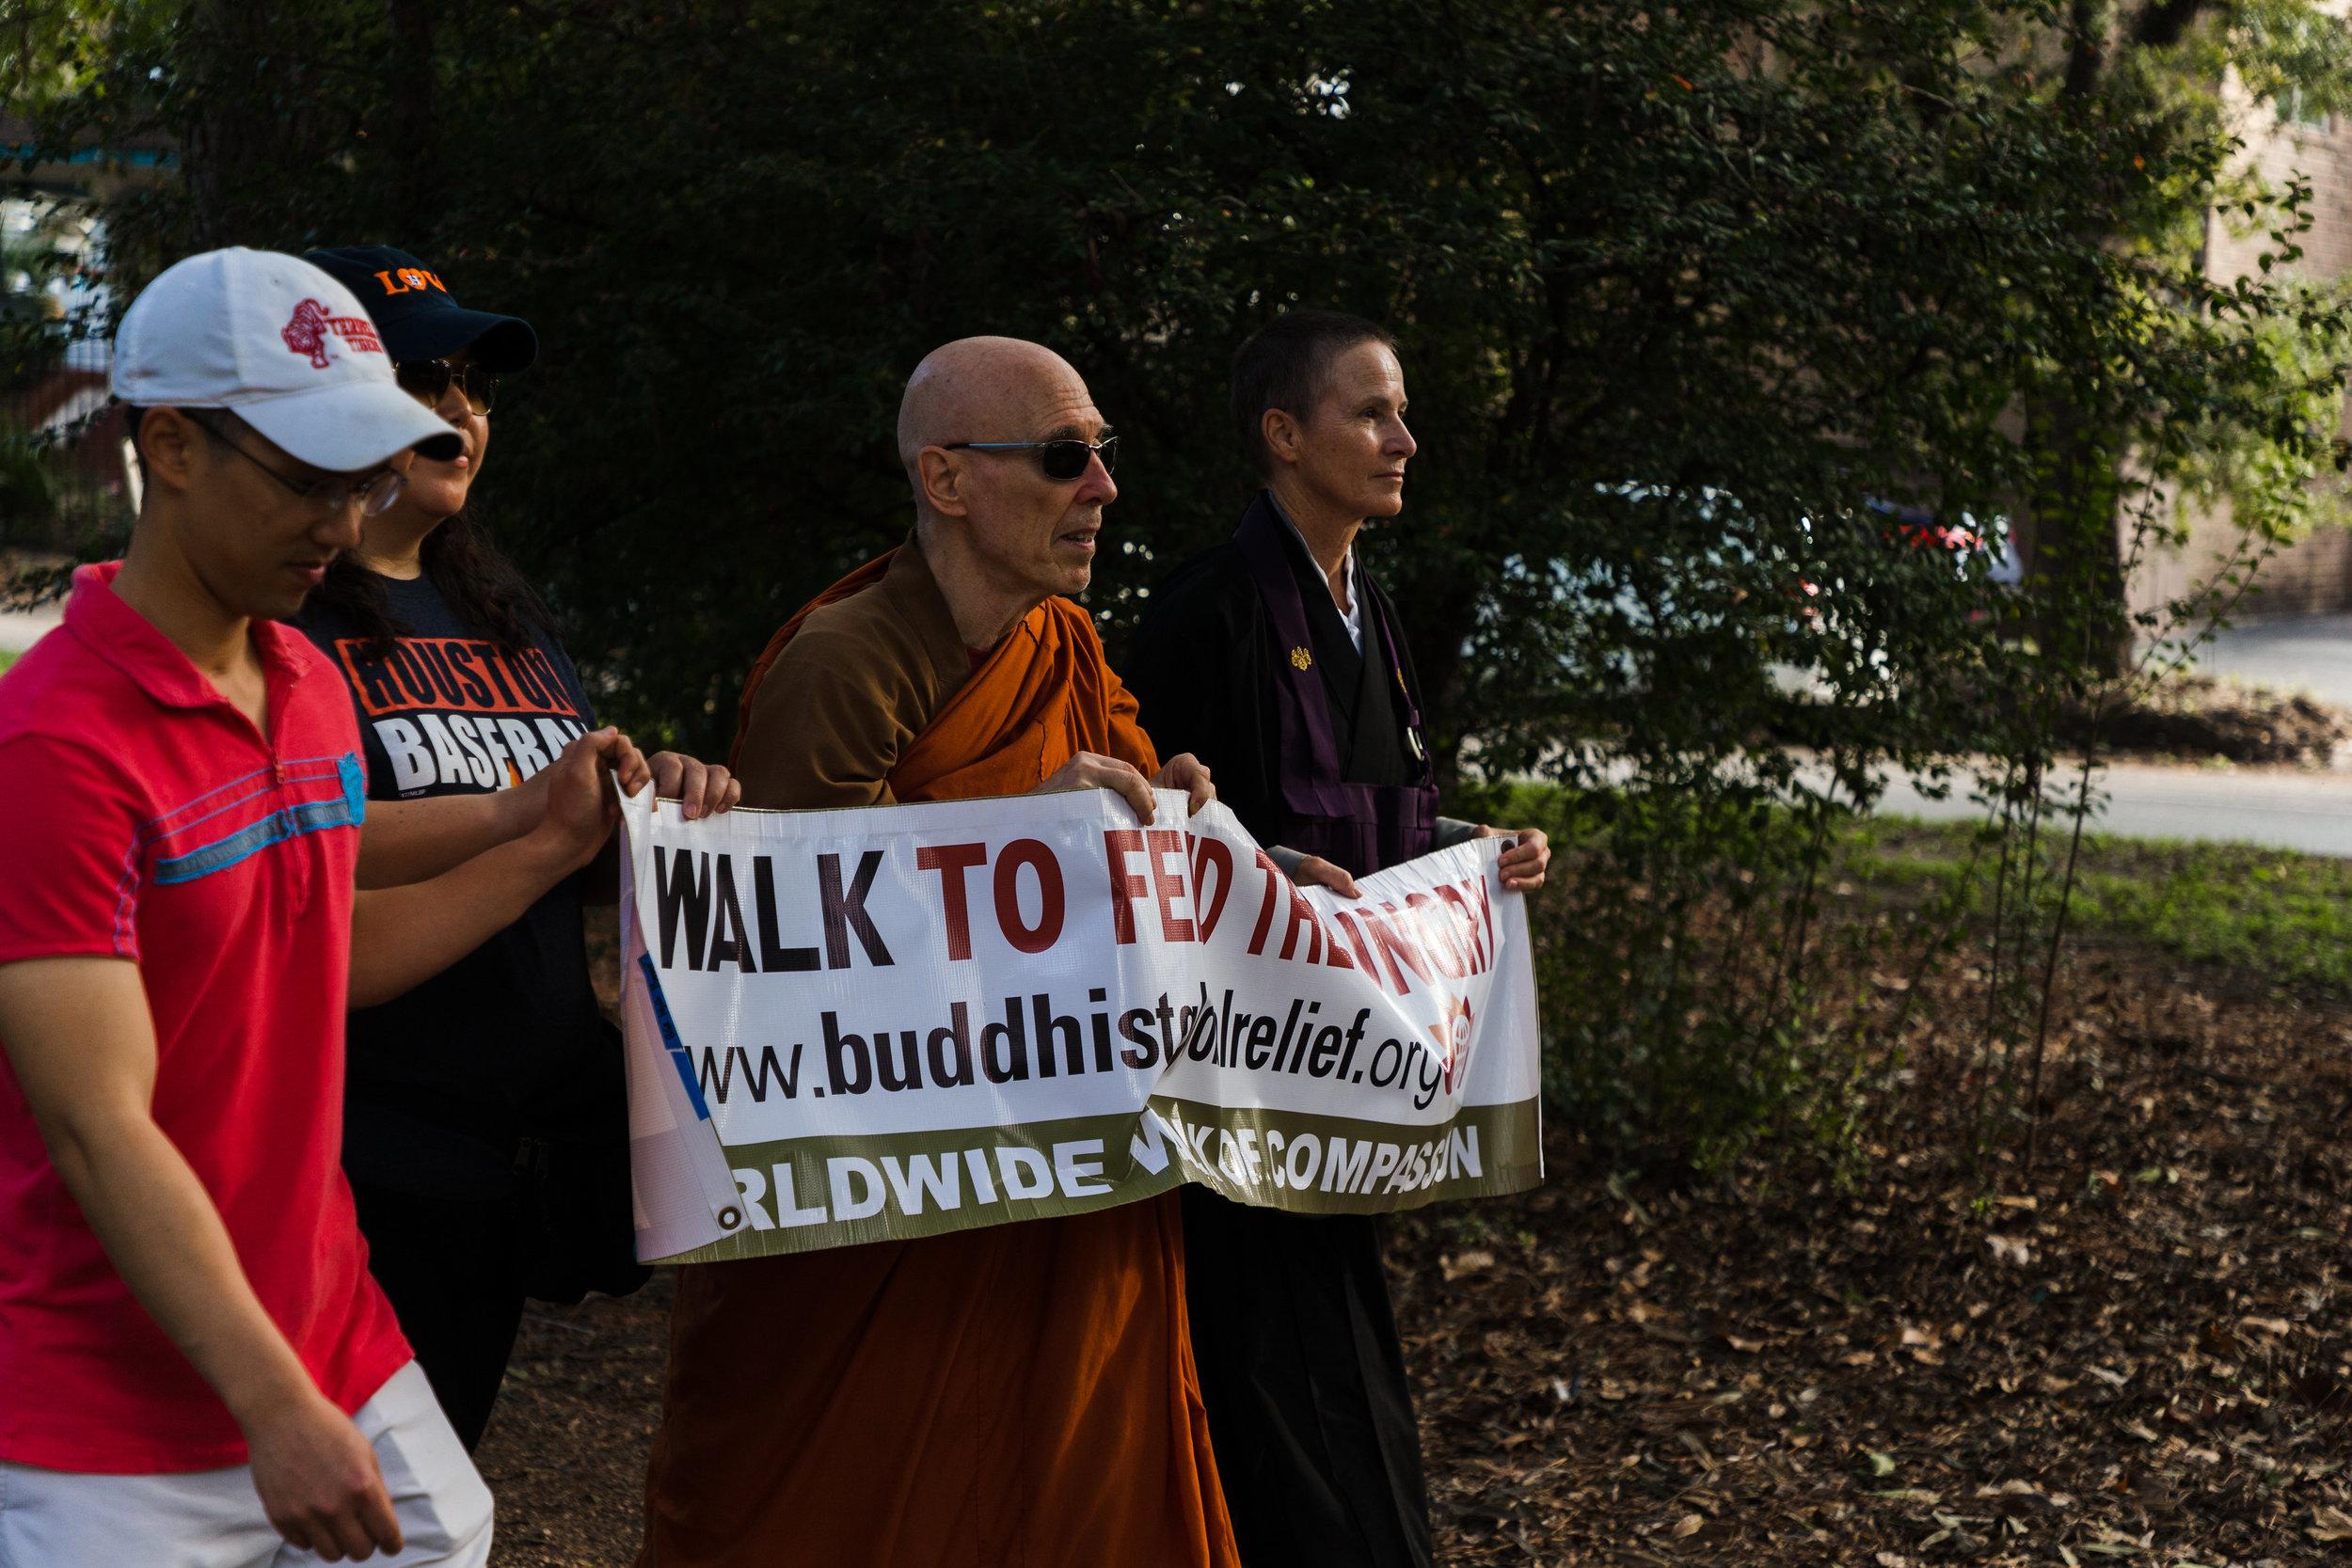 Bhikkhu-Bodhi-Global-Relief-Houston-Zen-Walk-45.jpg